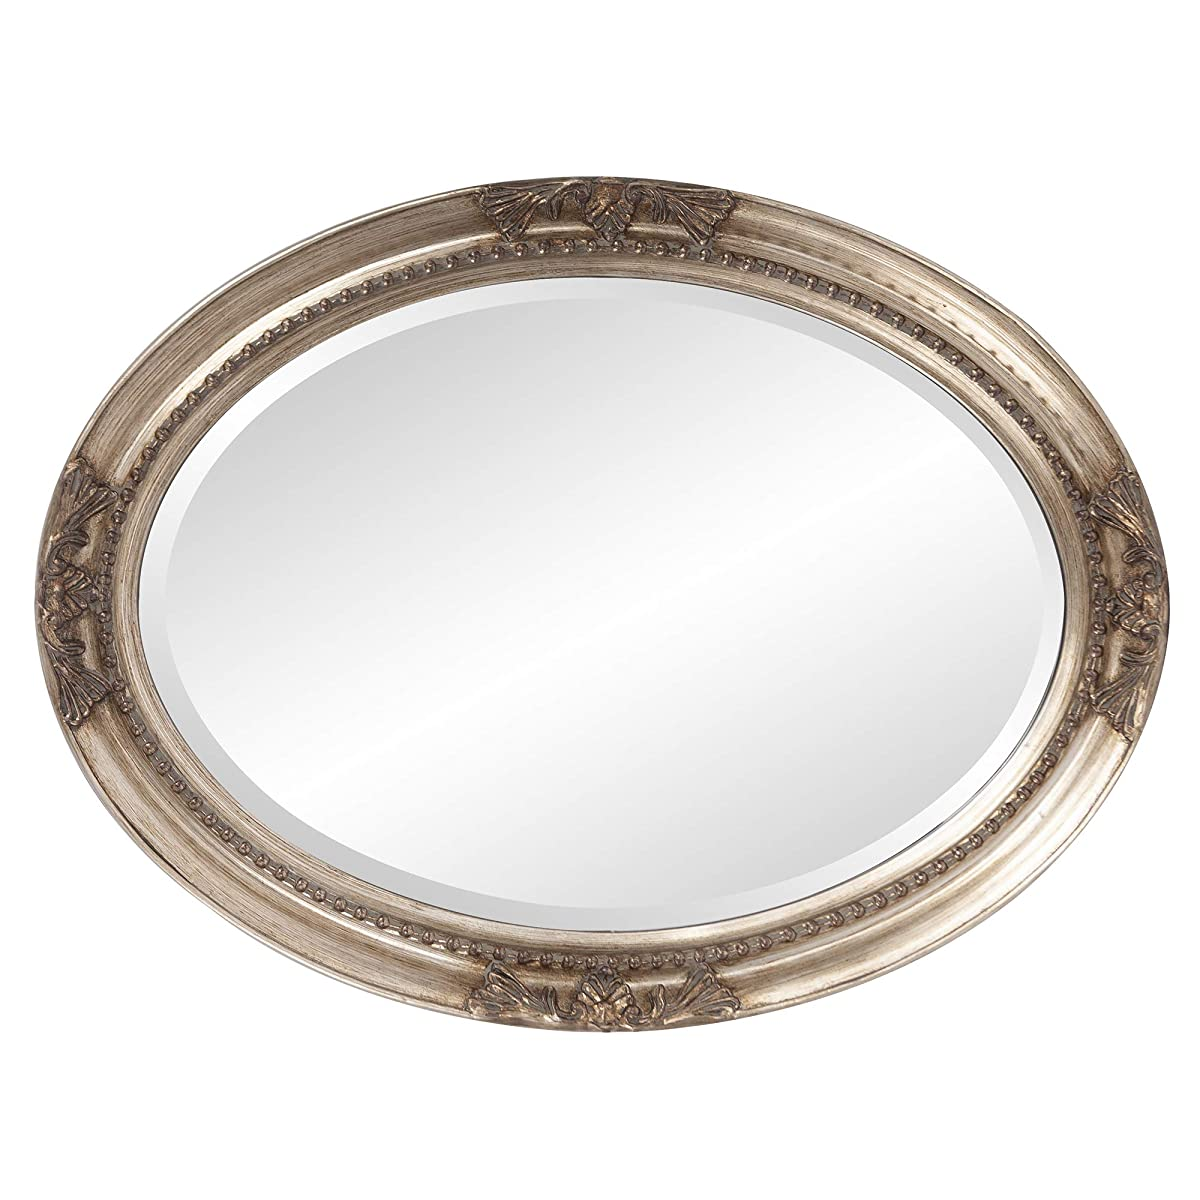 Howard Elliott Queen Anne Mirror, Hanging Beveled Oval Wall Mirror, Antique Silver Leaf